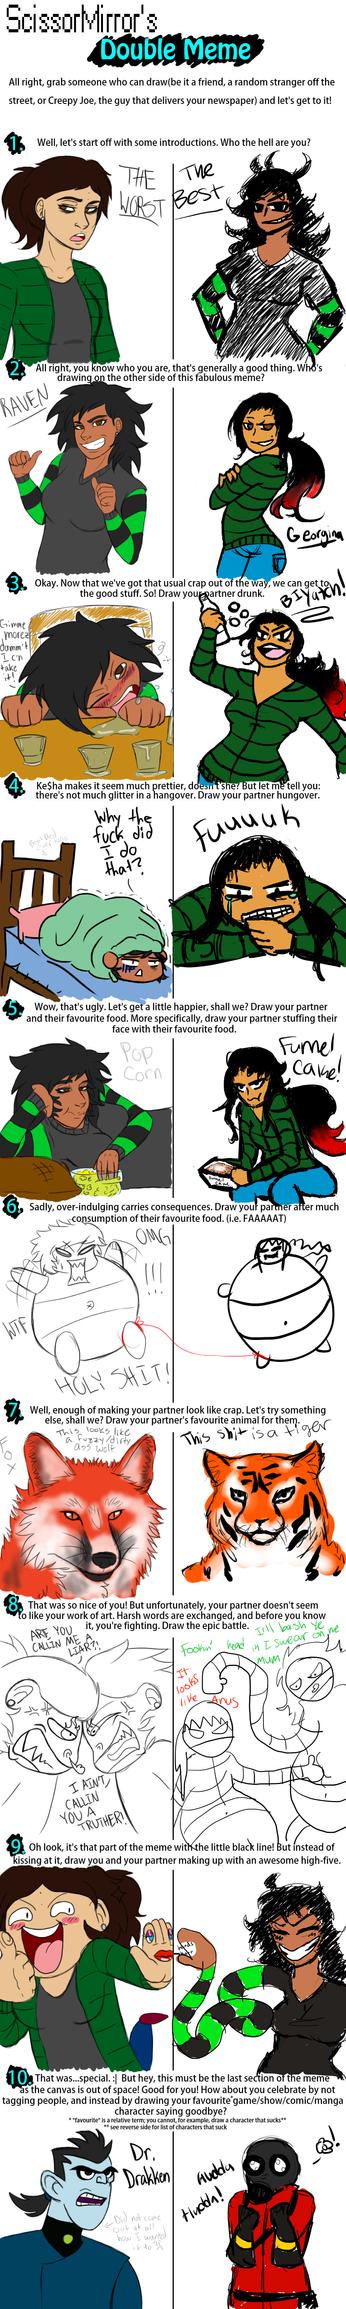 Double Meme with me pal Raven :D by KevinAF123